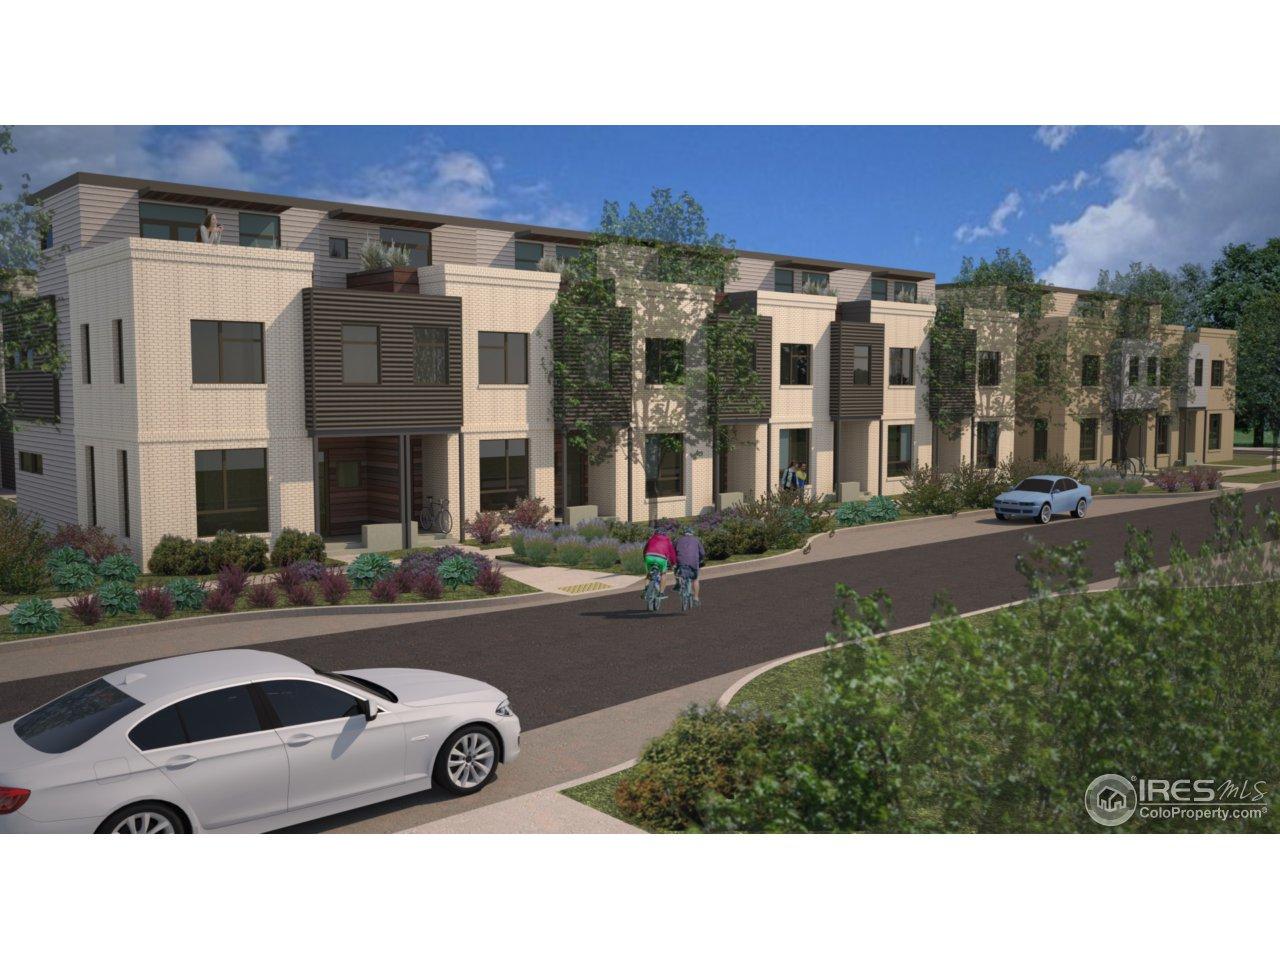 3125 Bluff St, Boulder CO 80301